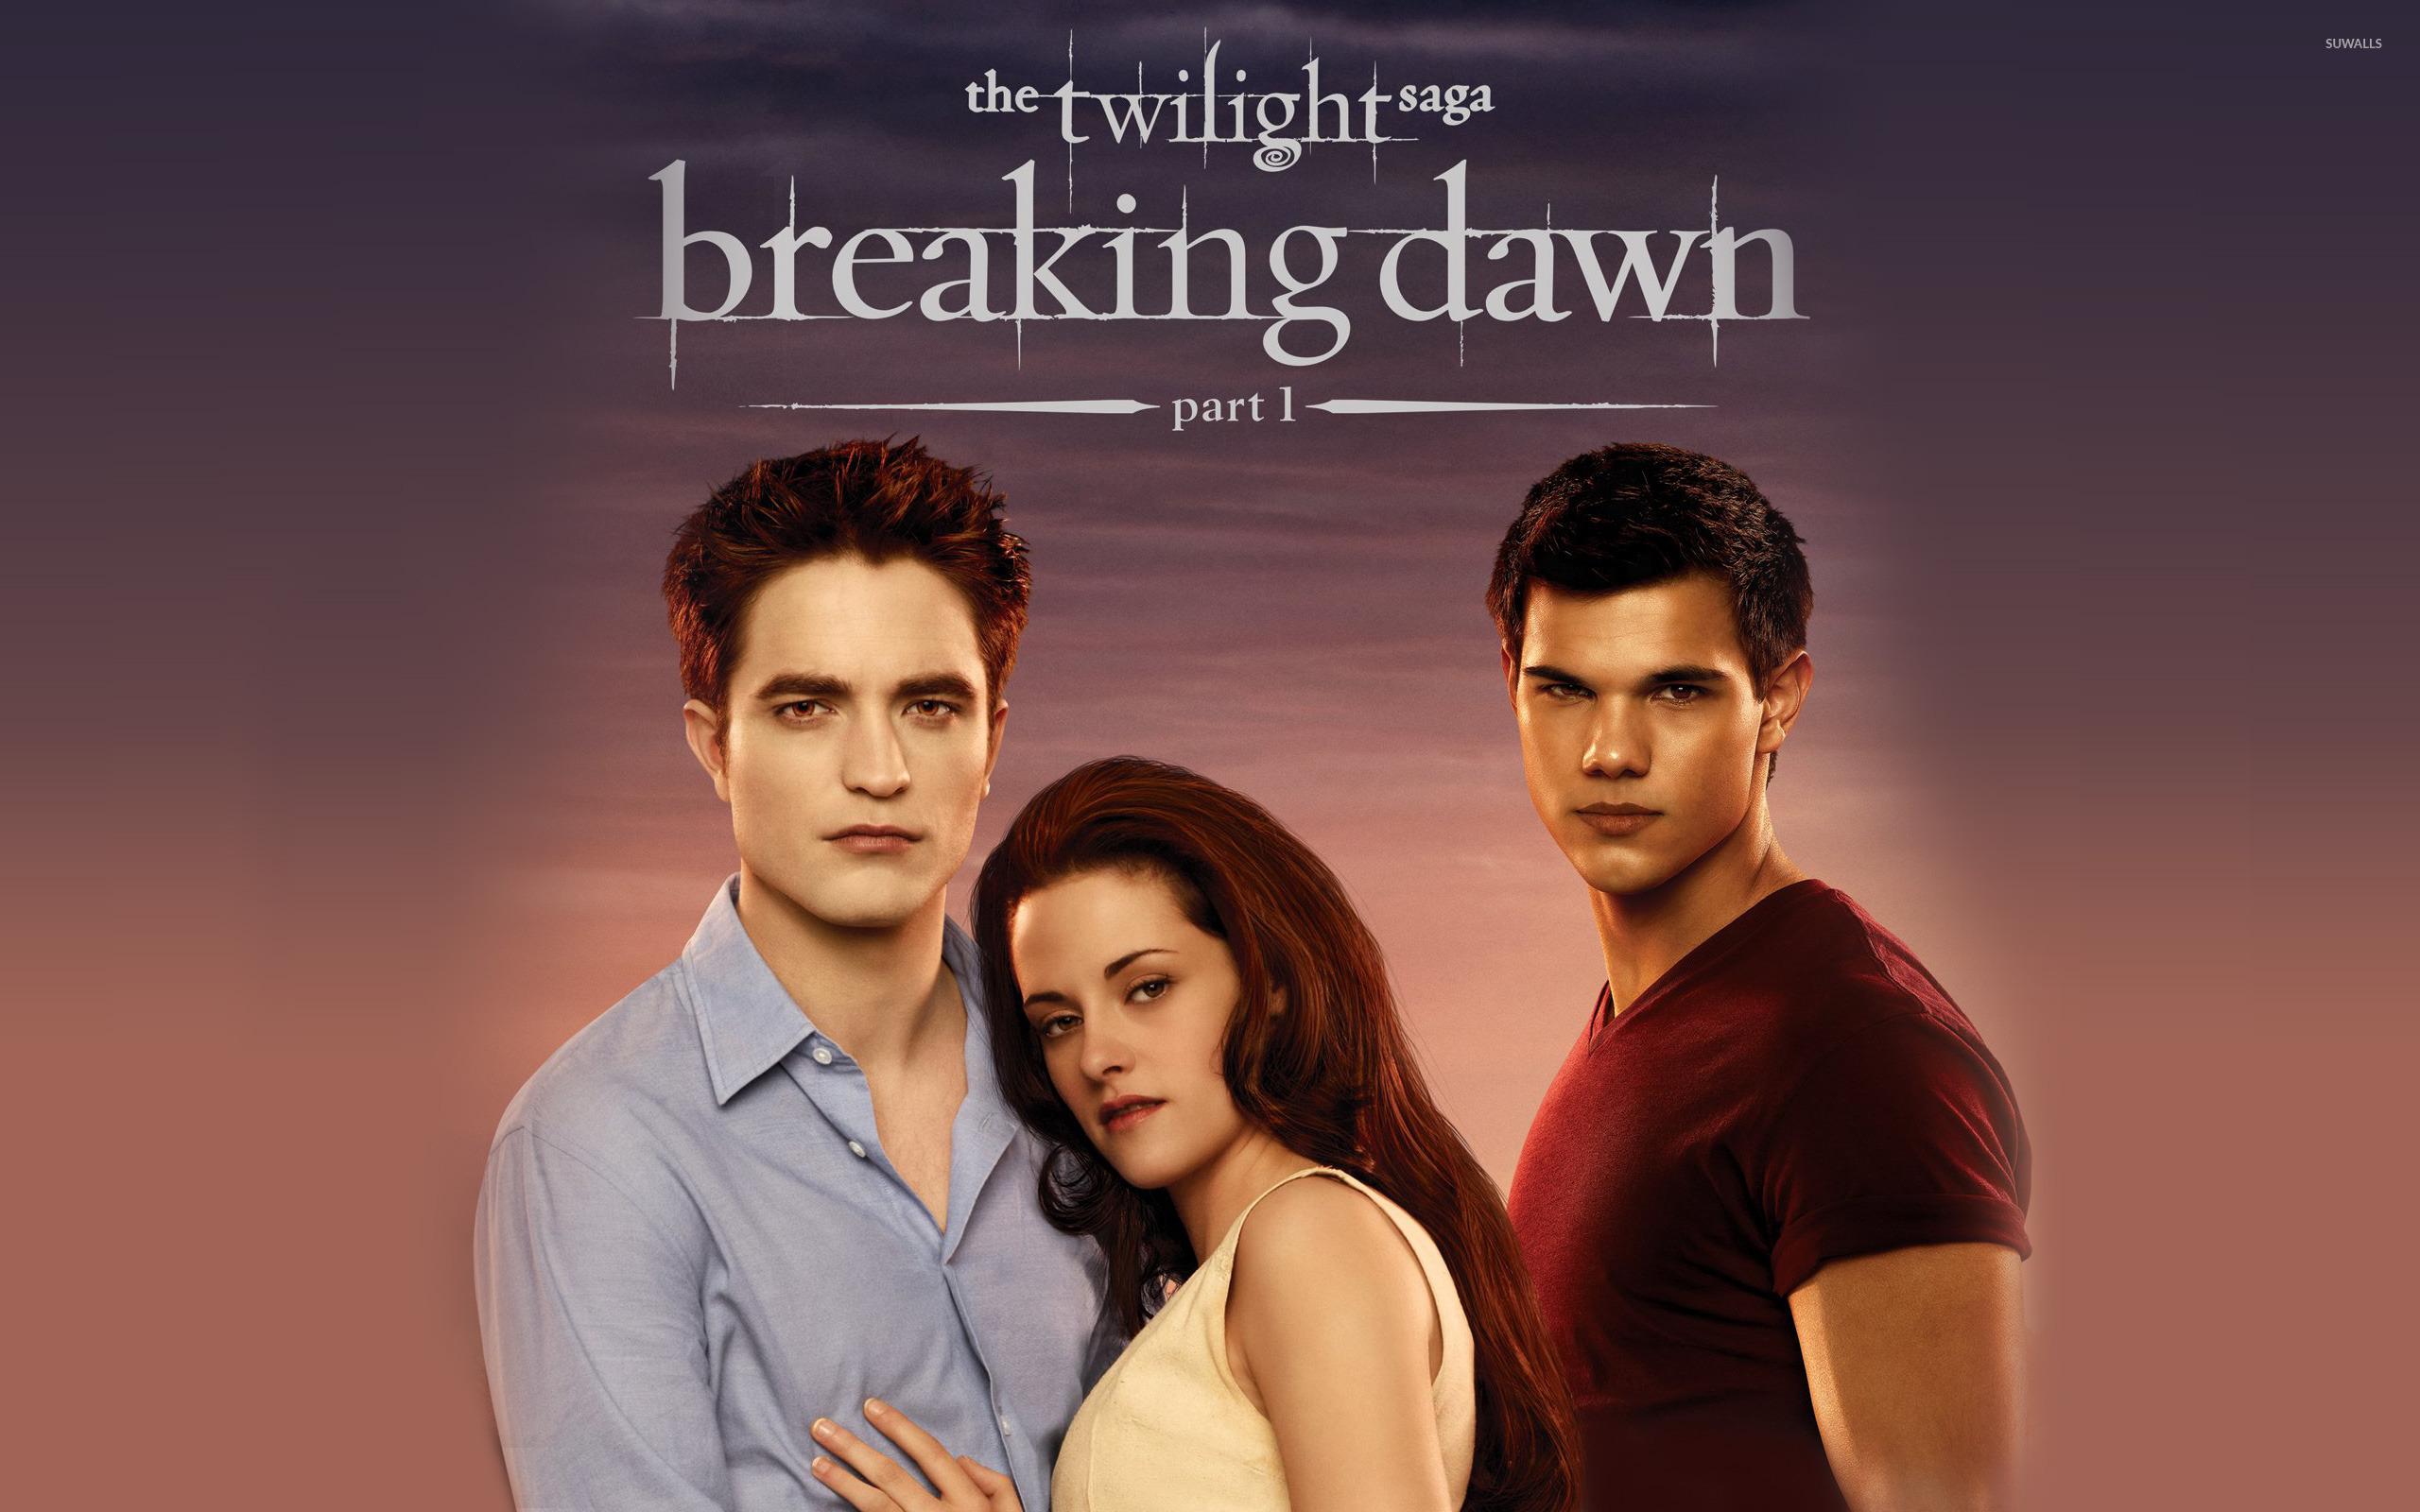 the twilight saga: breaking dawn: part 1 [3] wallpaper - movie